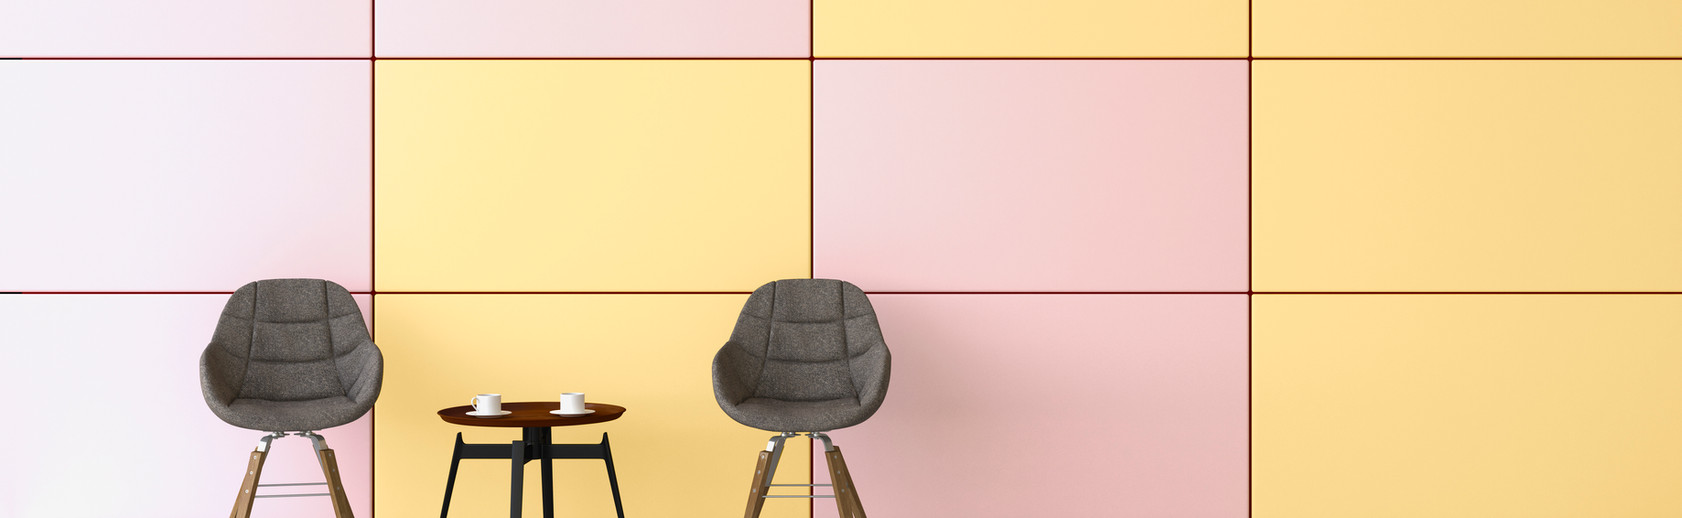 Farbige Wand